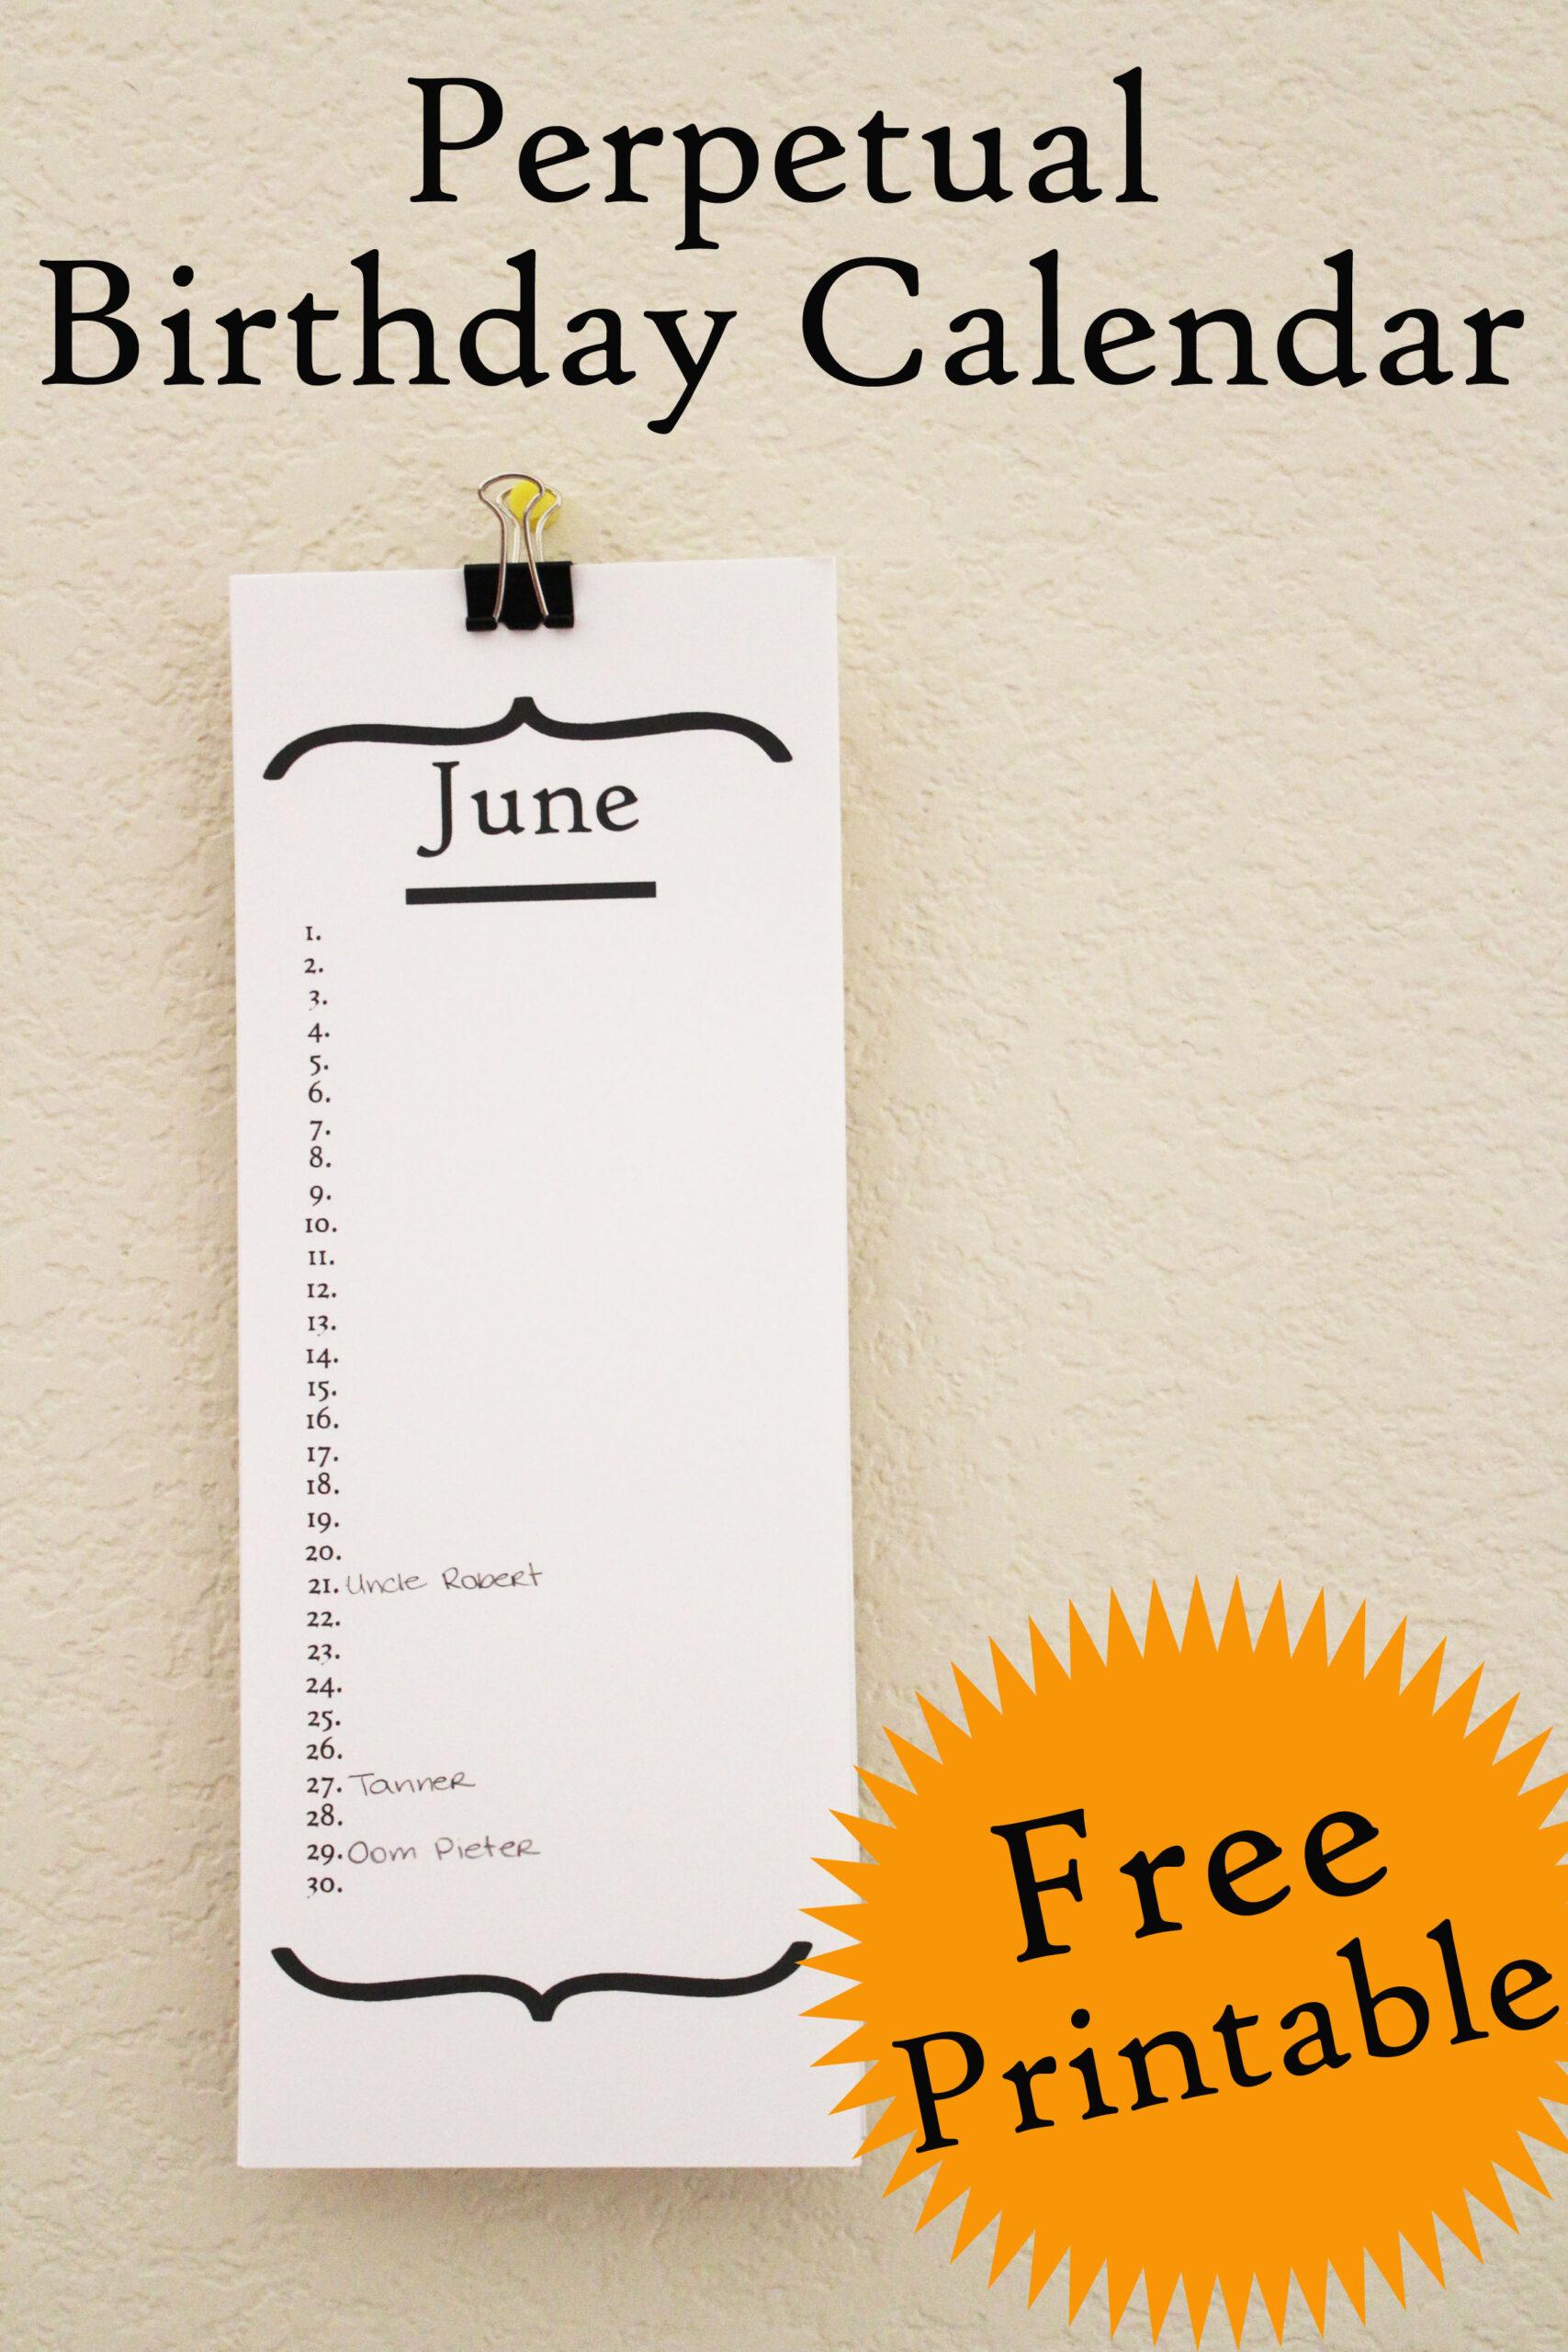 Free Birthday Calendar Printable  30 Minute Crafts in Free Perpetual Calendar Printable